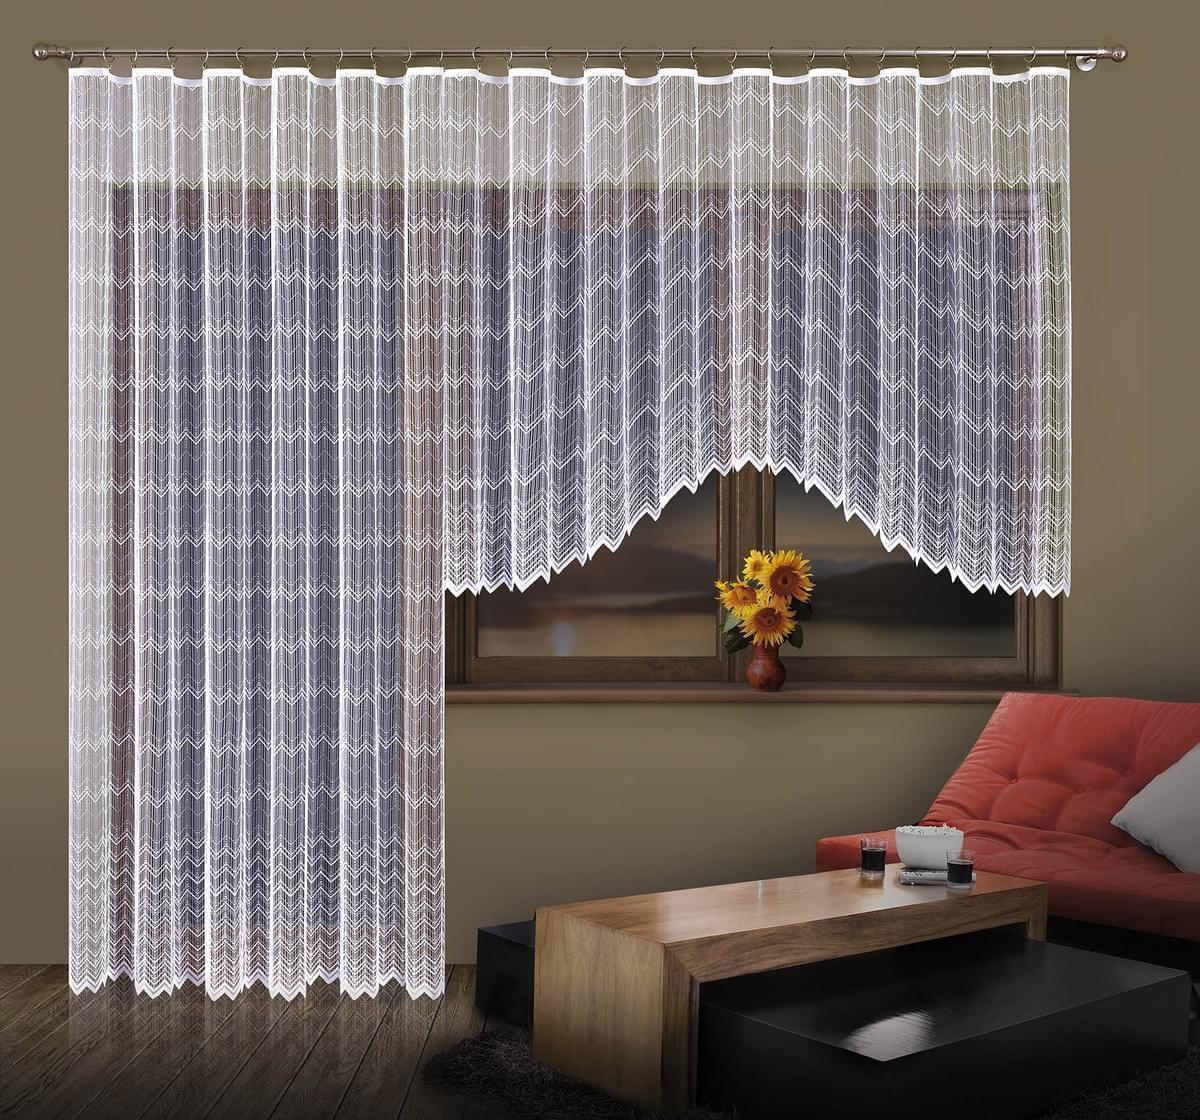 Forbyt, Balkonový záclonový komplet Margarita 350 x 160 cm + 200 x 250 cm